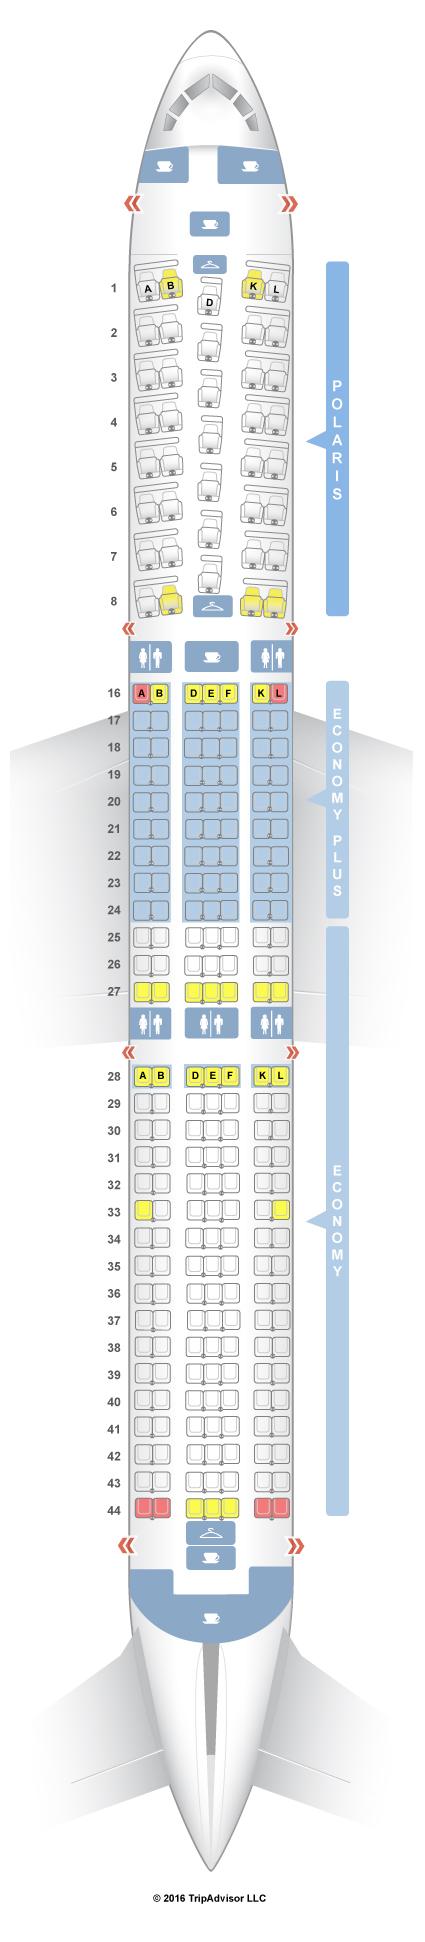 Seatguru Seat Map United Boeing 767 400er 764 Intl Seatguru Seatguru The Unit Boeing 767